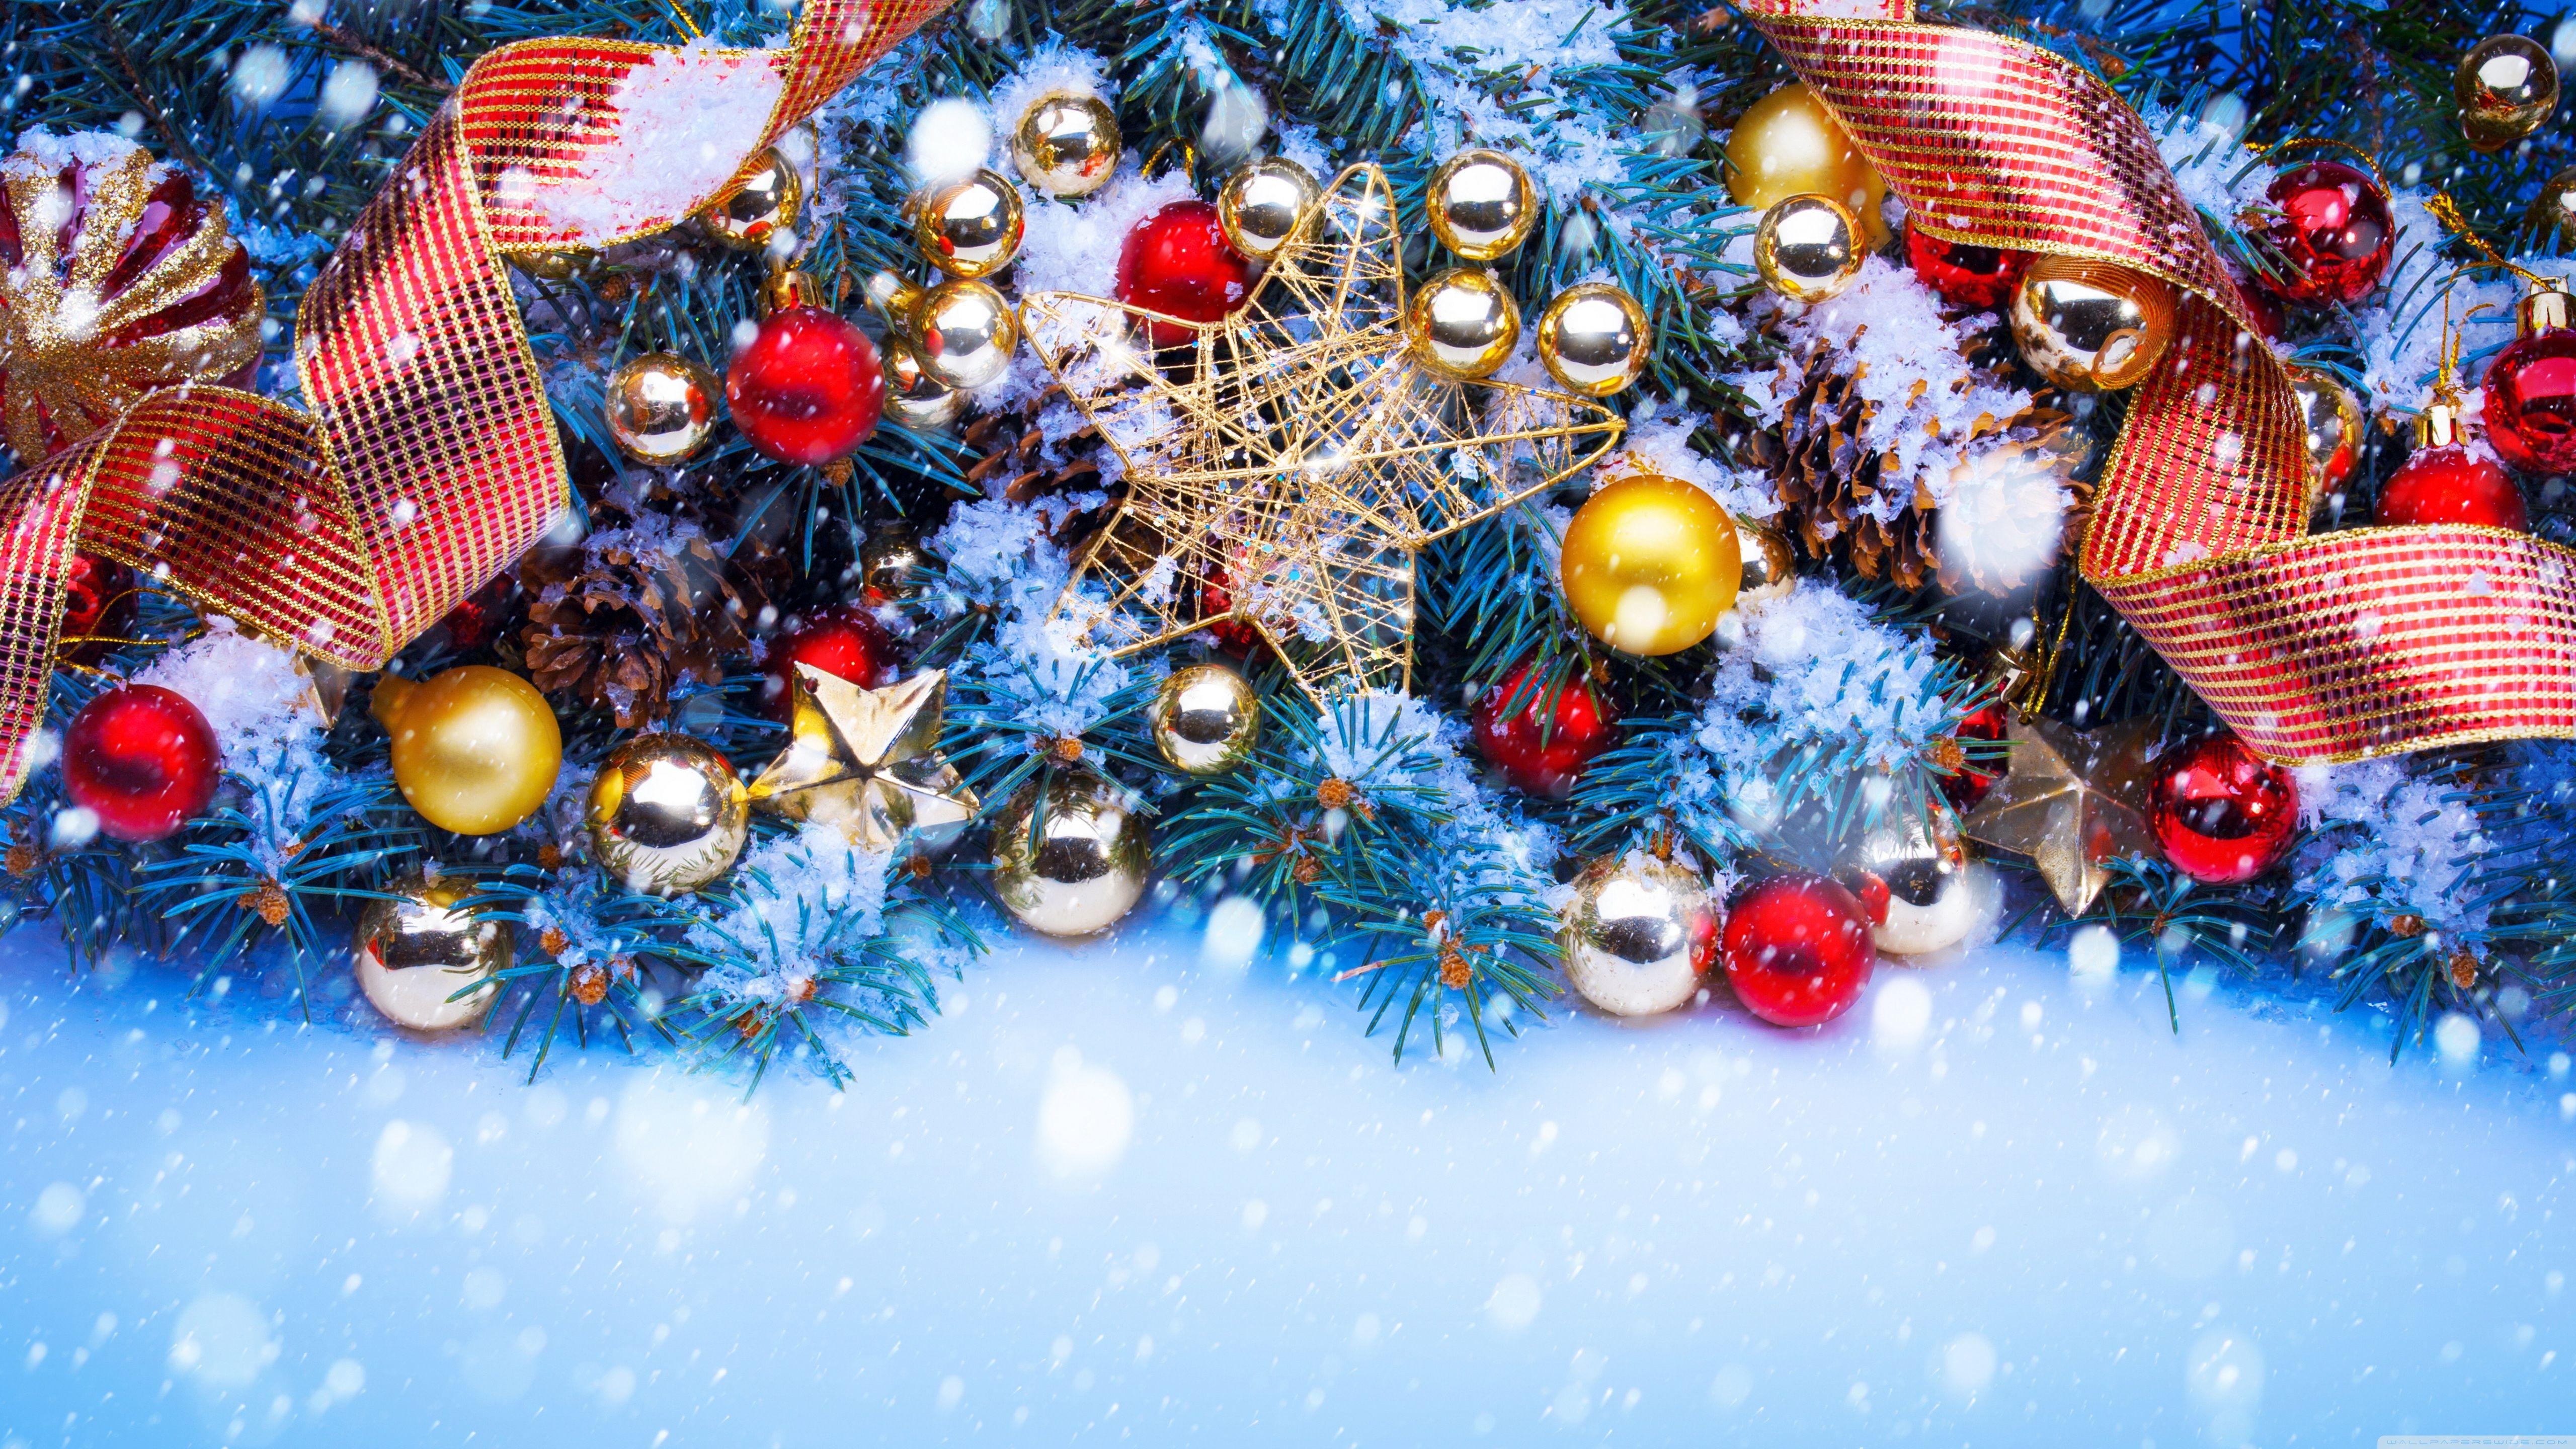 Beautiful Outdoor Christmas Tree HD desktop wallpaper